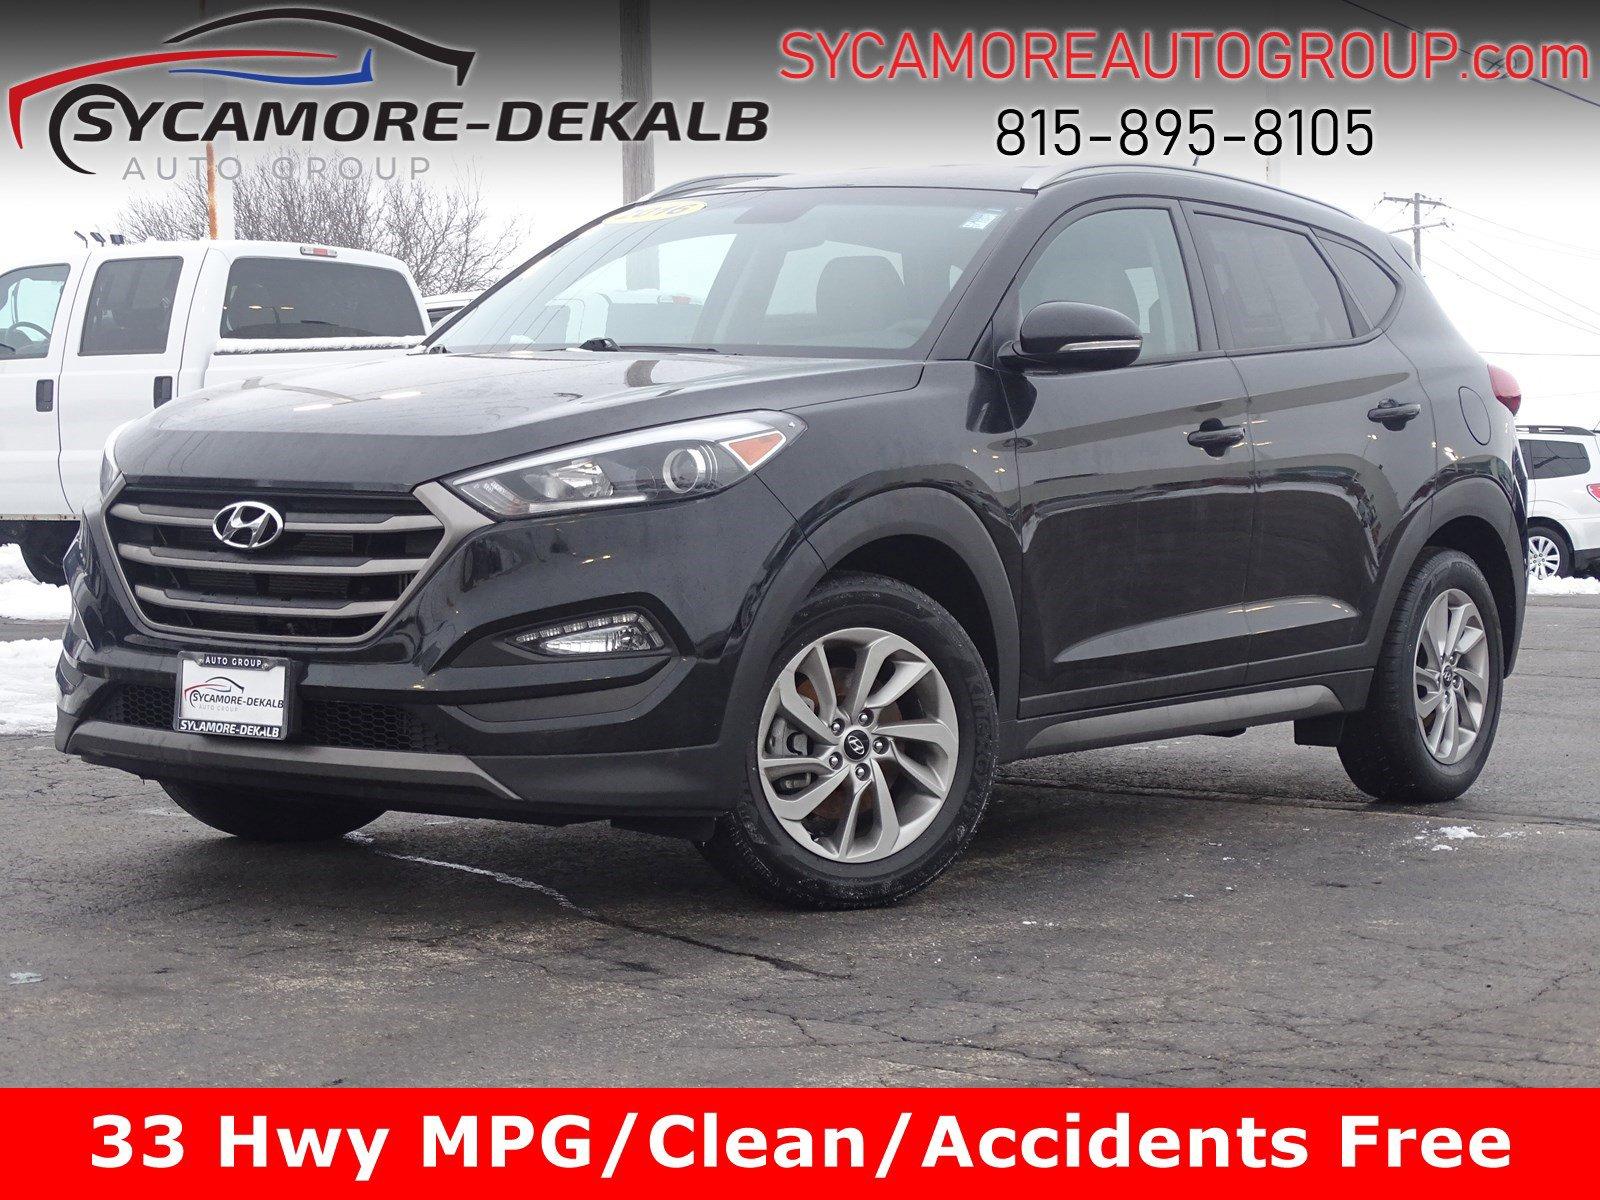 Pre-Owned 2016 Hyundai Tucson Eco